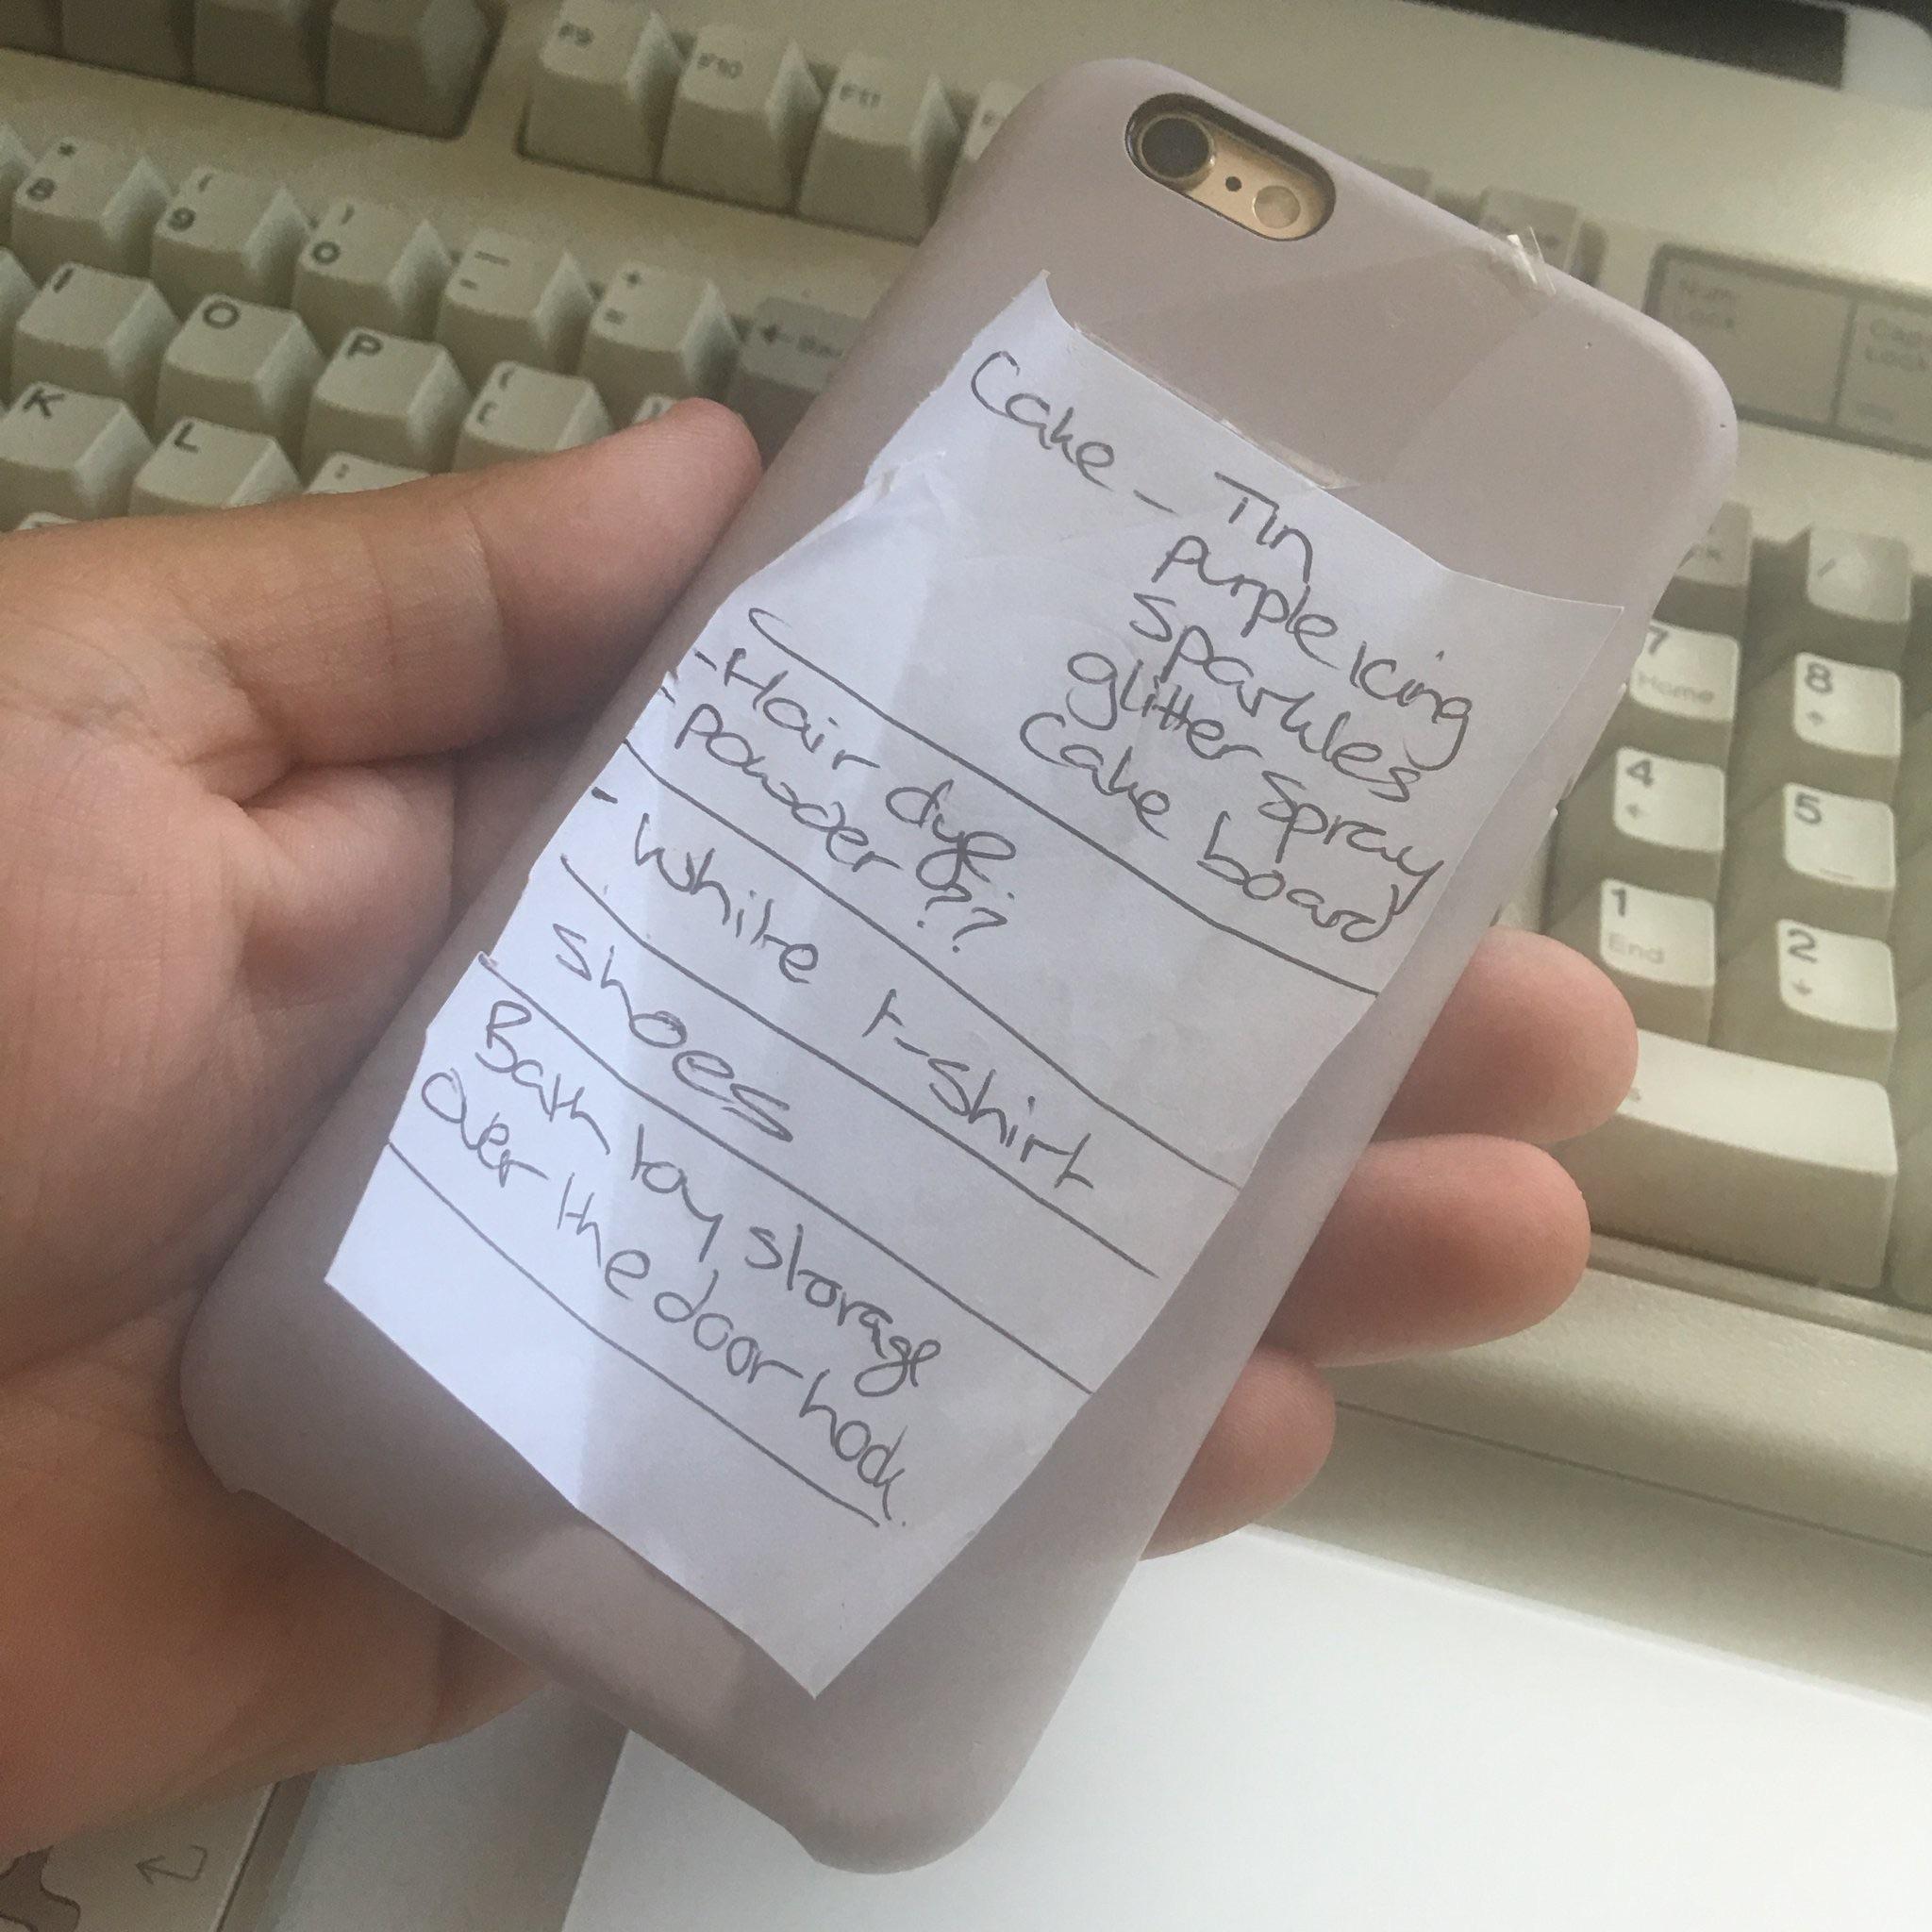 """My wife made her own todo list app. #iosdev"" -- @craftydeano on Twitter"